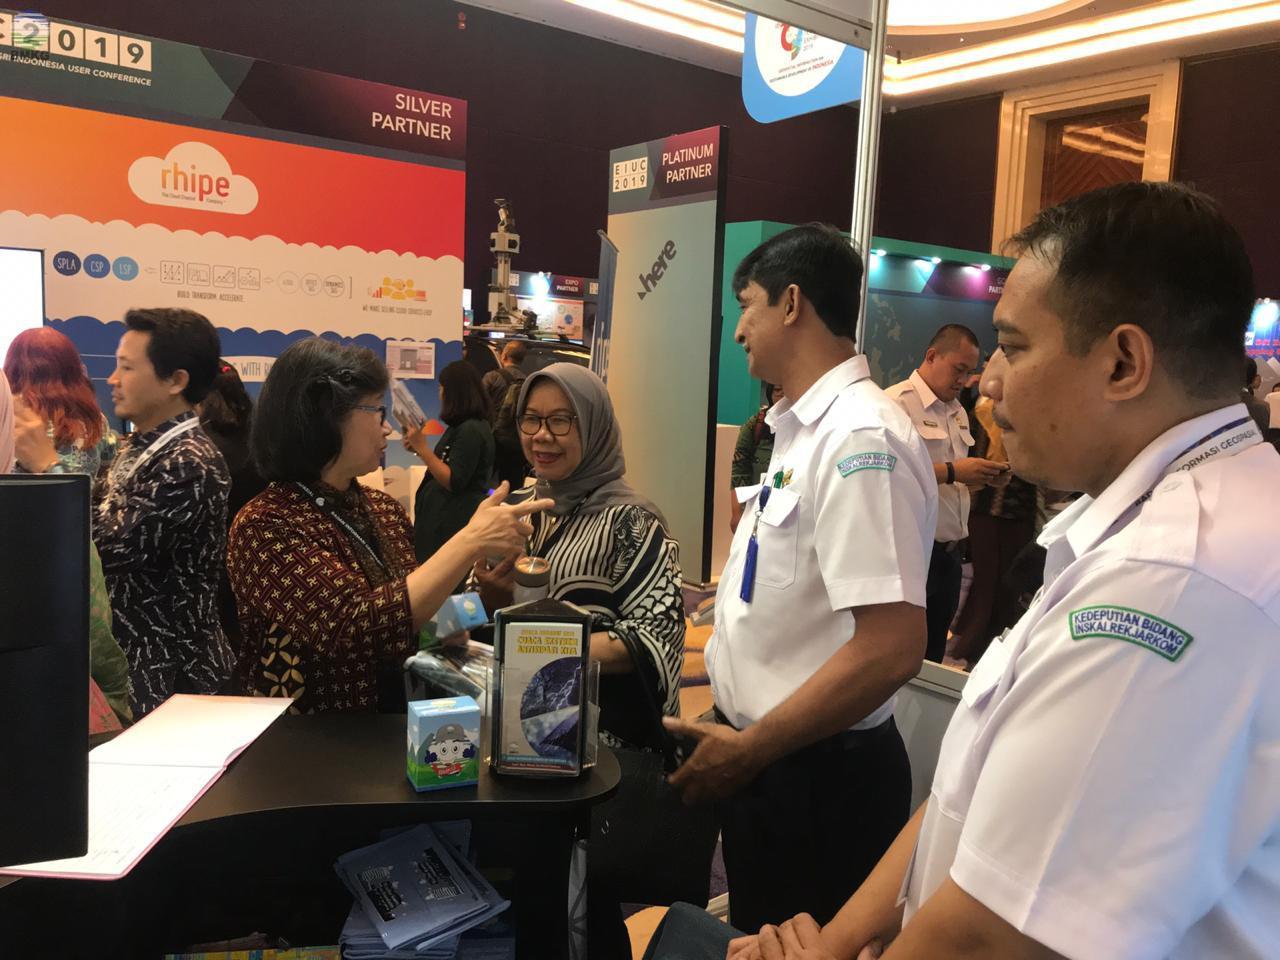 BMKG Berperan Aktif dalam Kegiatan Indonesia Geospatial Technology Exhibition - IGTE 2019